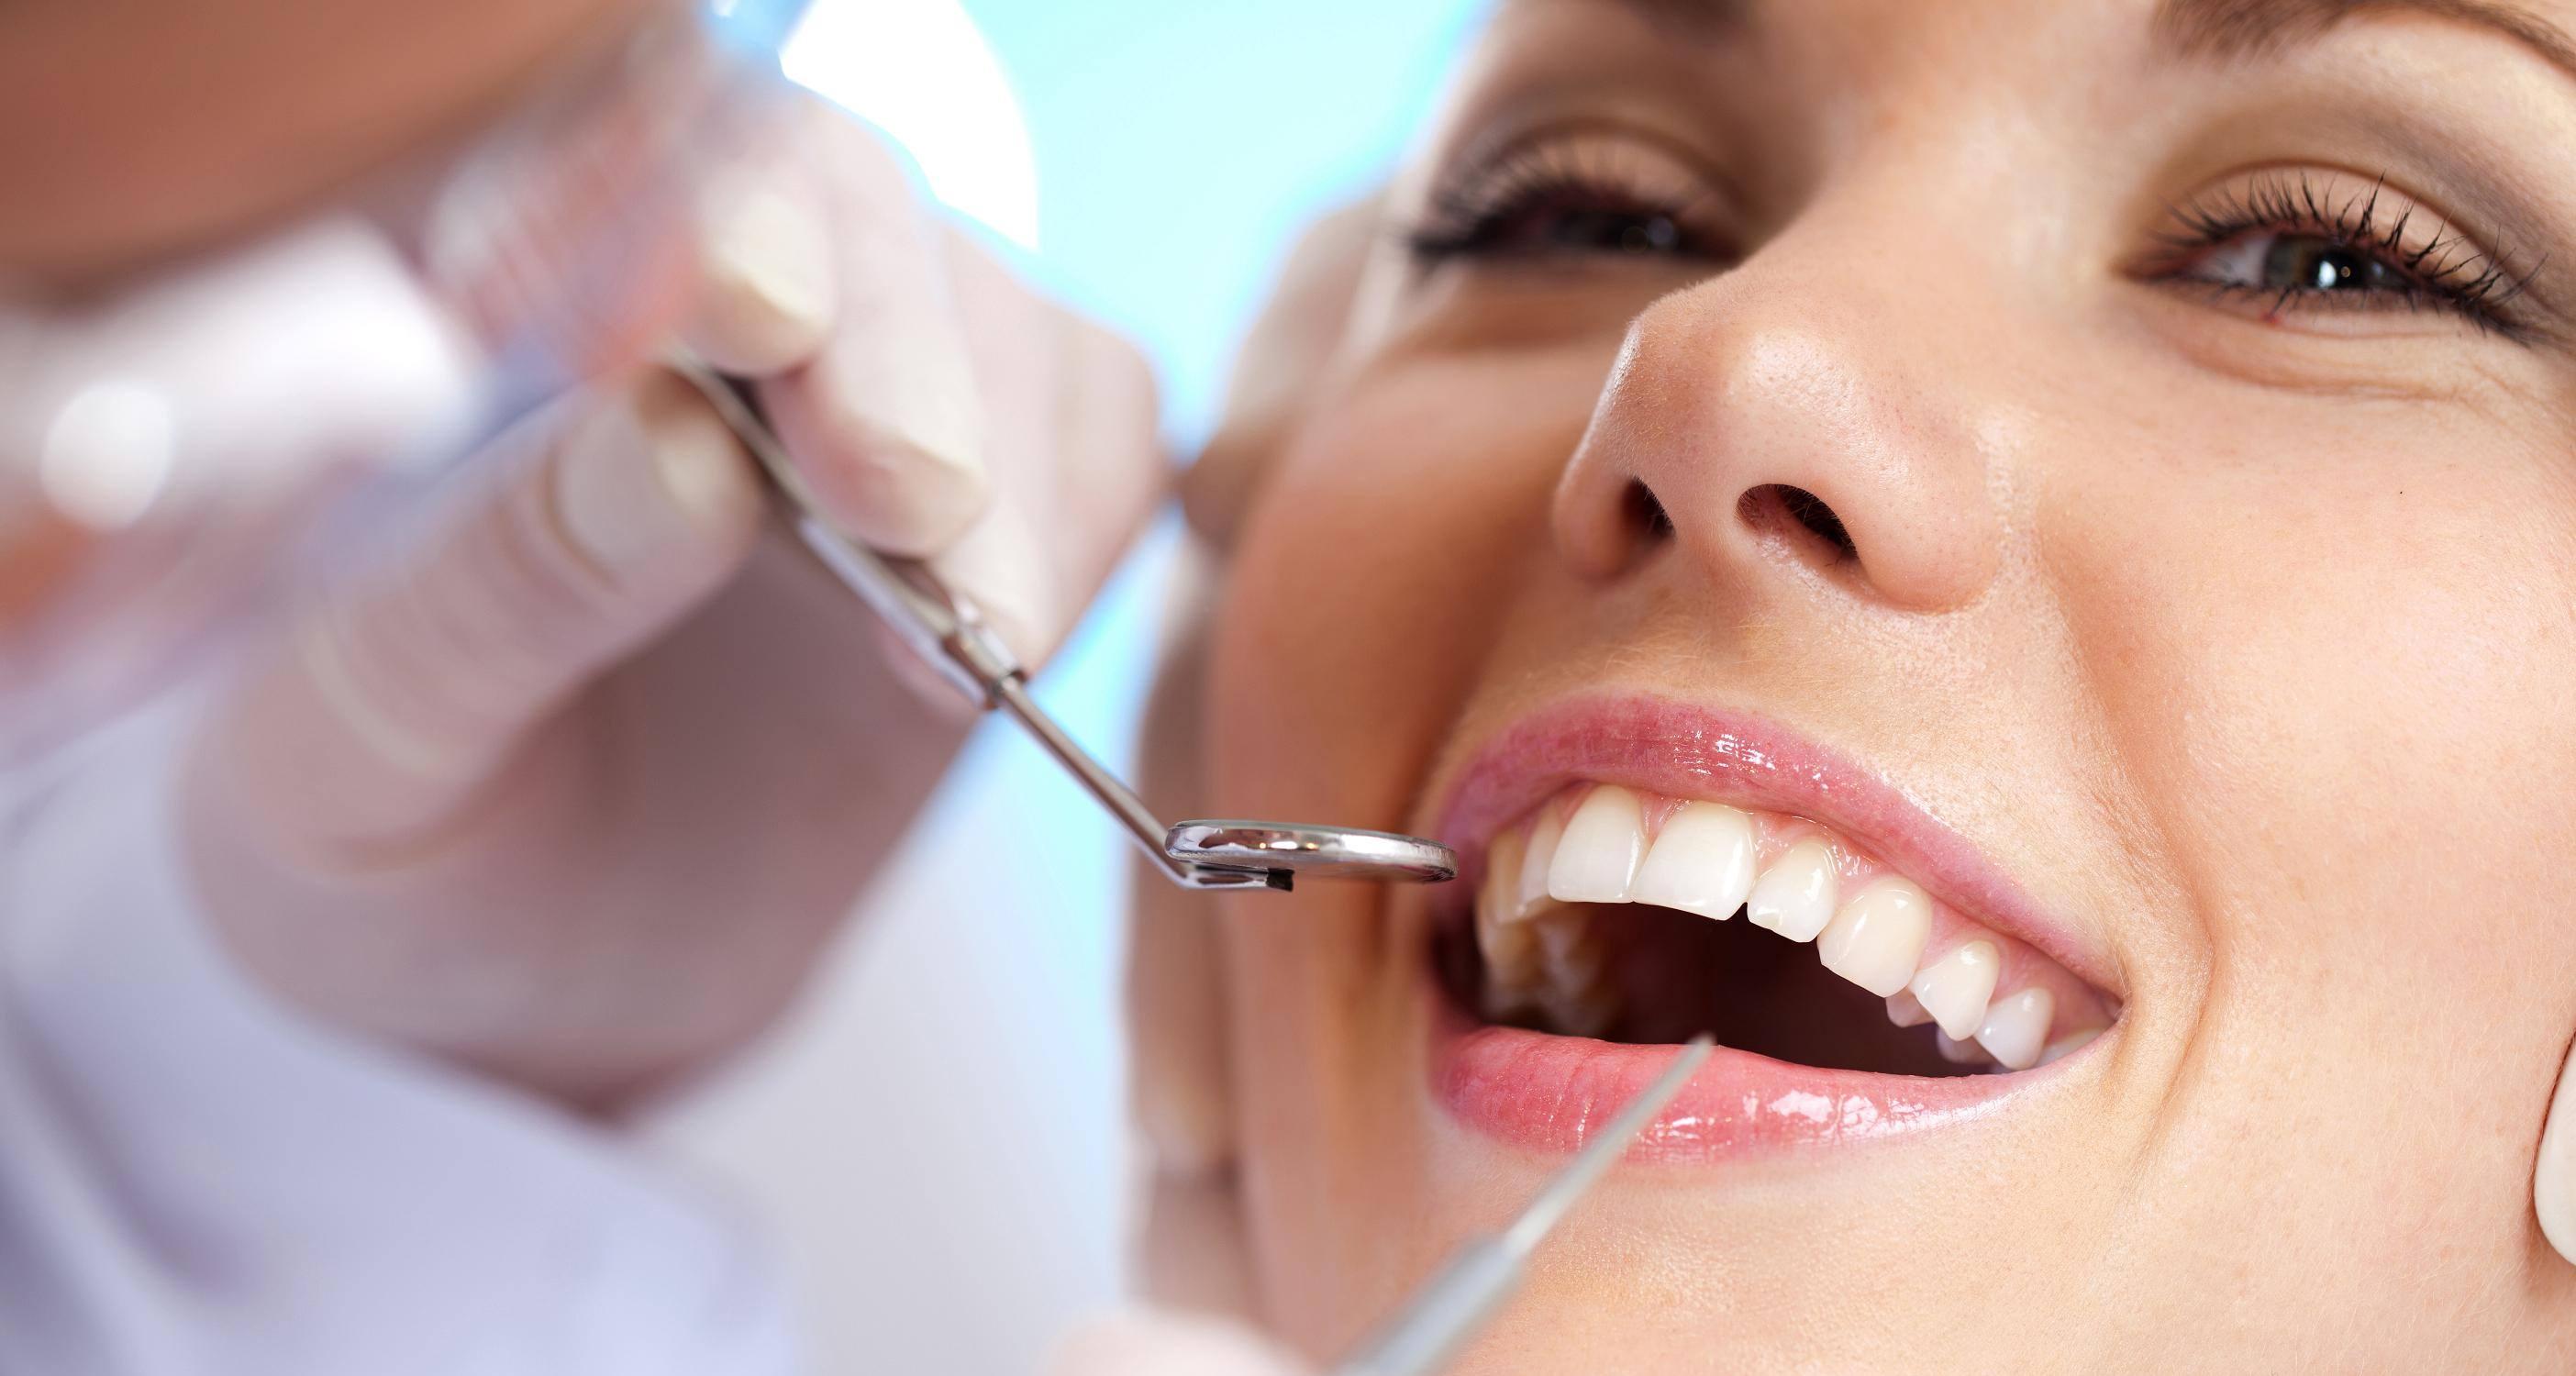 ezsmile dental care san diego poway carmel valley rancho